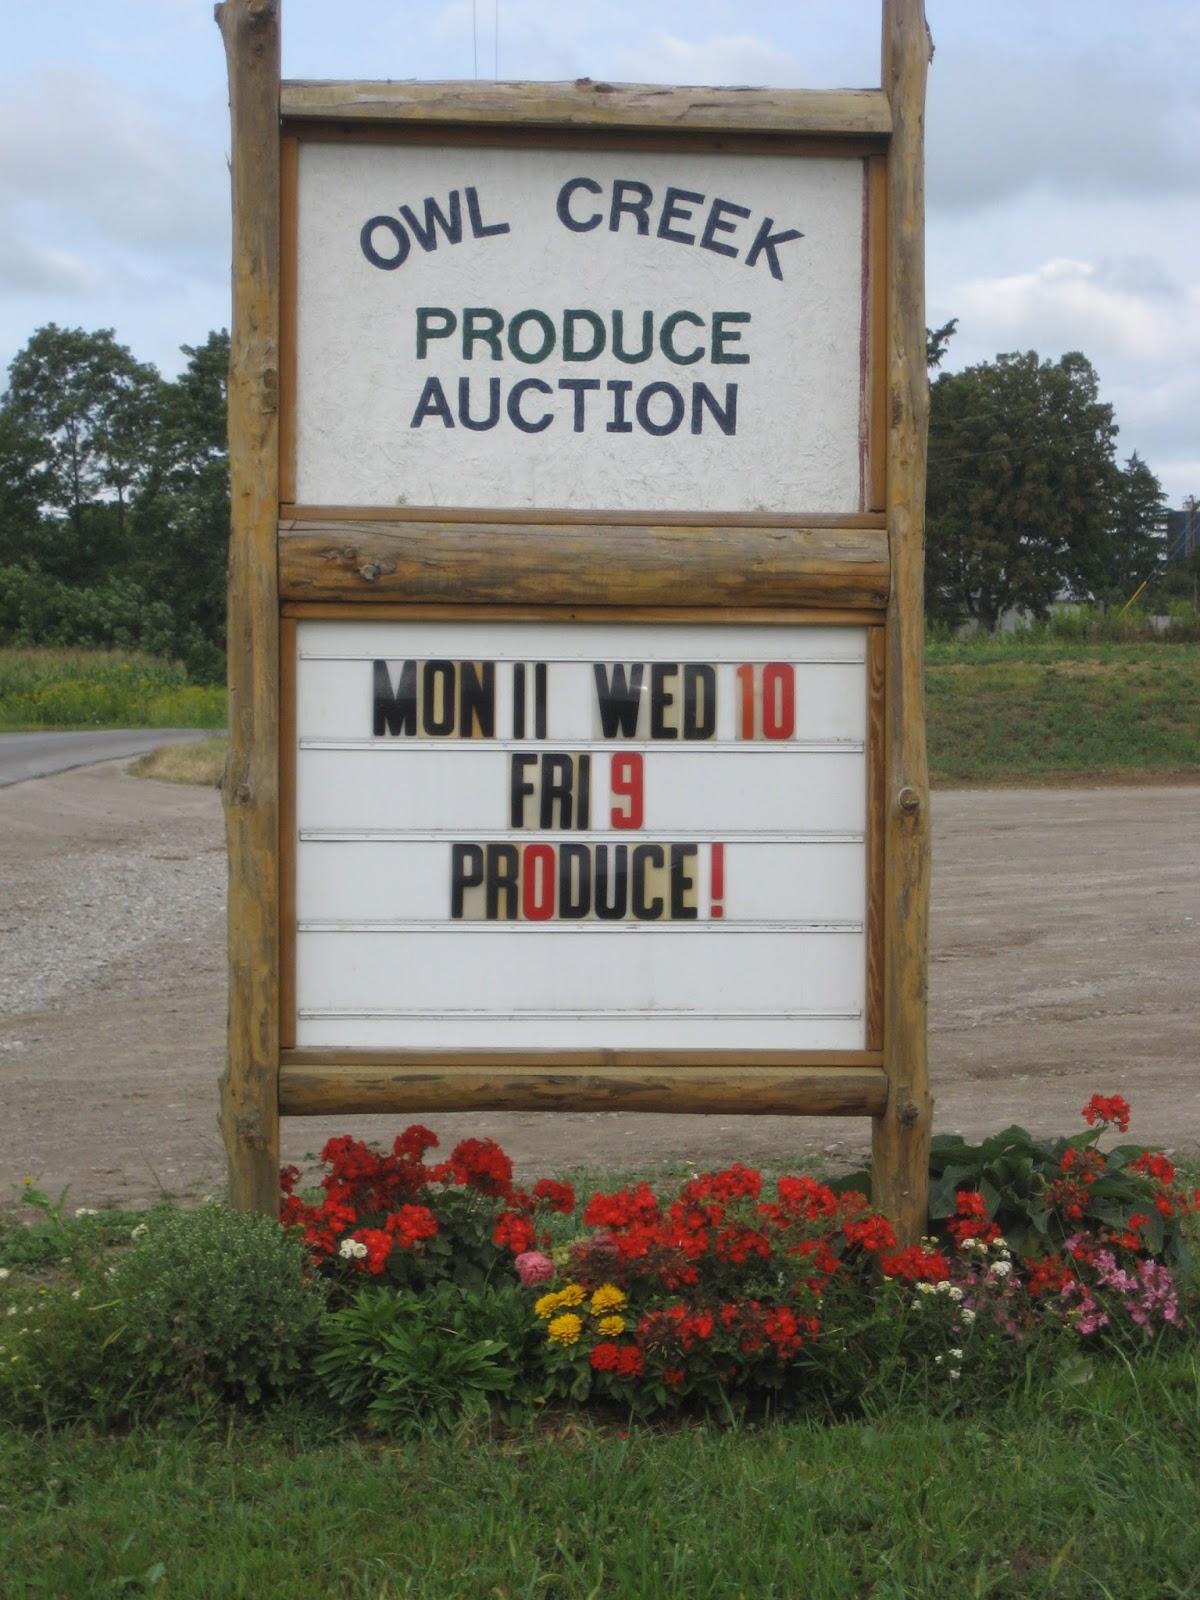 Owl creek produce auction 06 15 15 for Owl creek